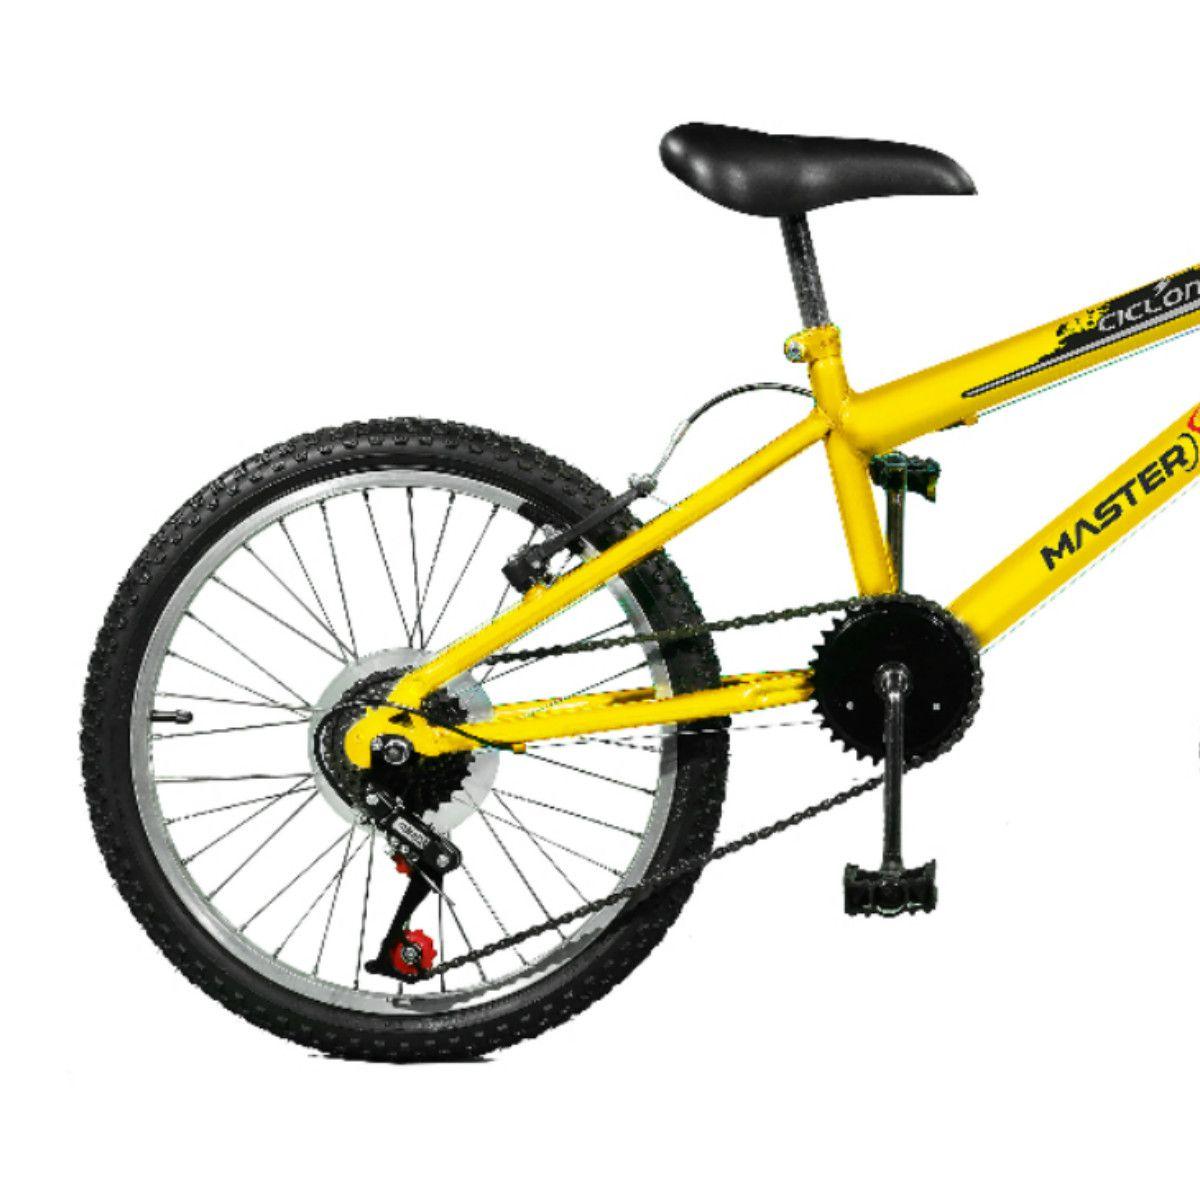 Bicicleta Master Bike Aro 20 Ciclone Plus 7 Marchas V-Brake Amarelo